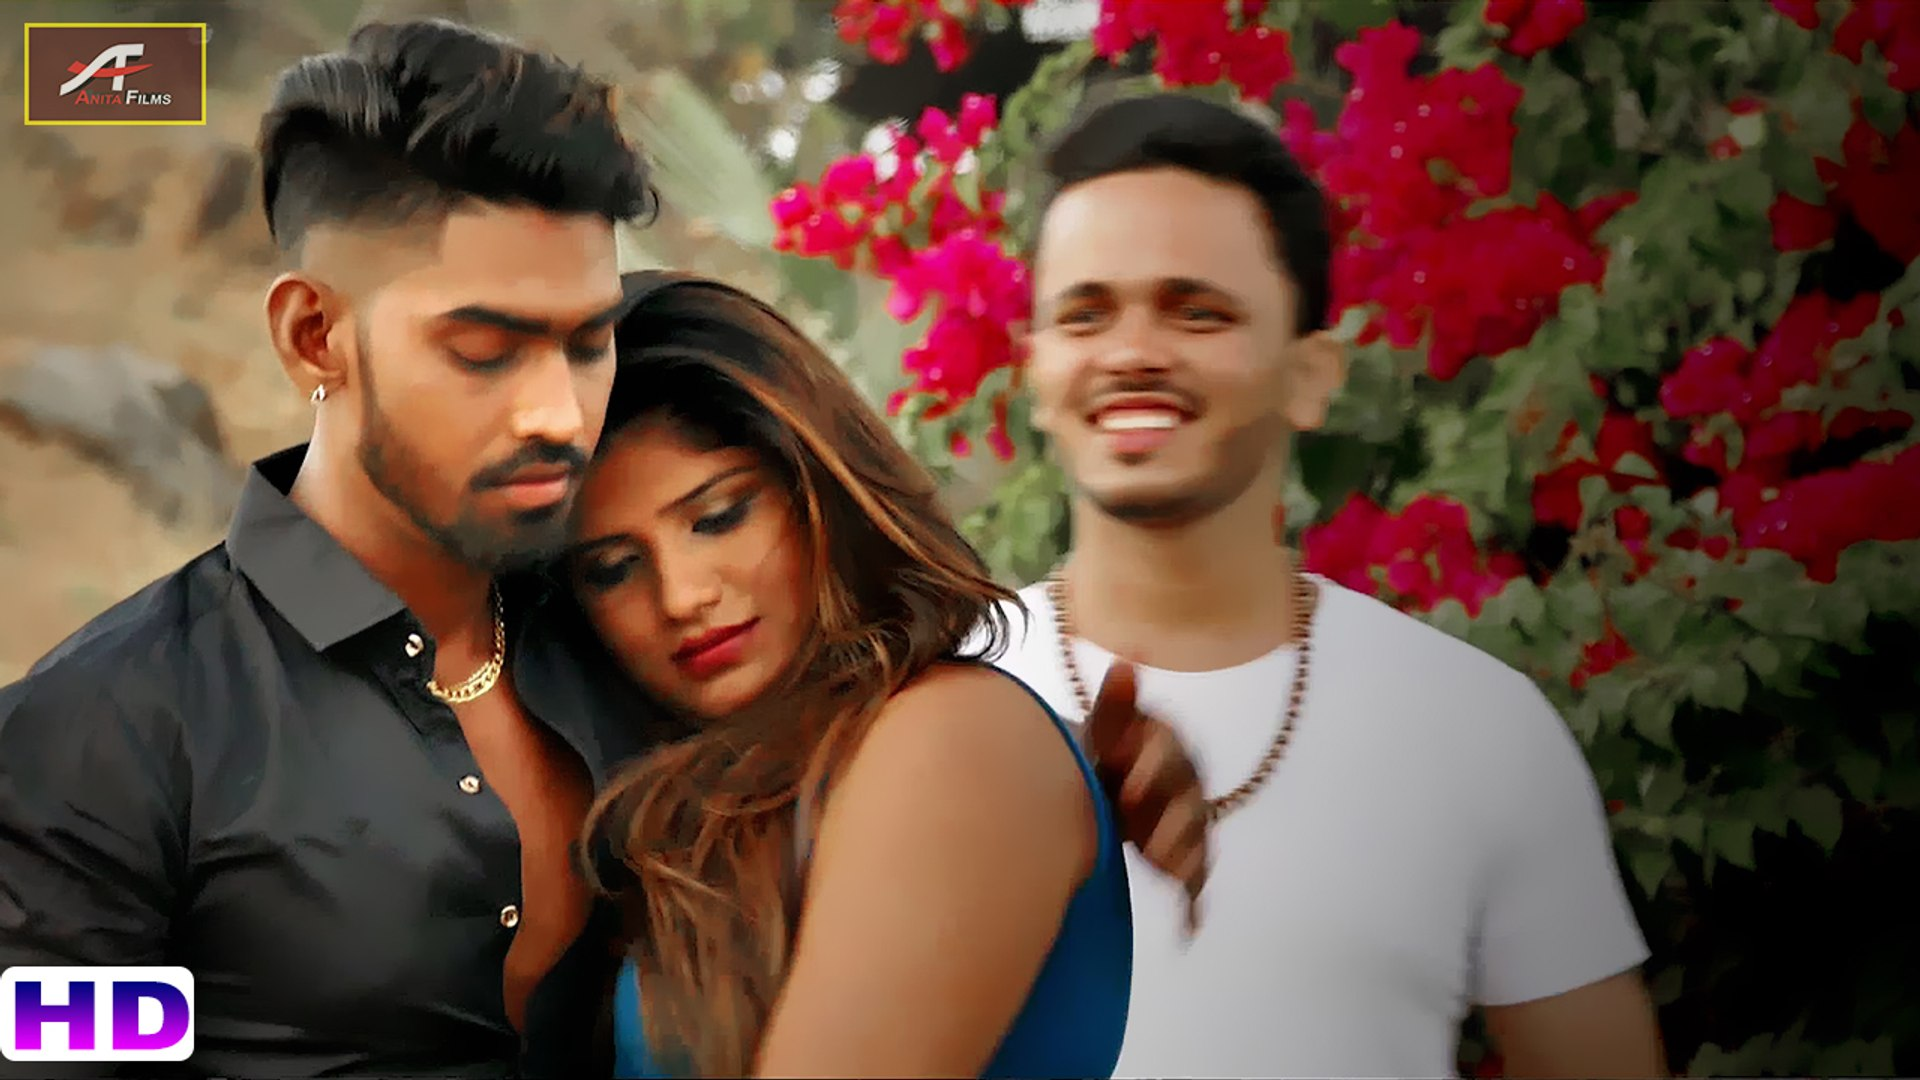 Heart Teaching Songs - Kaise Bhula Doon Main -  Love Story Video - Make U Cry - Latest Hindi Songs -